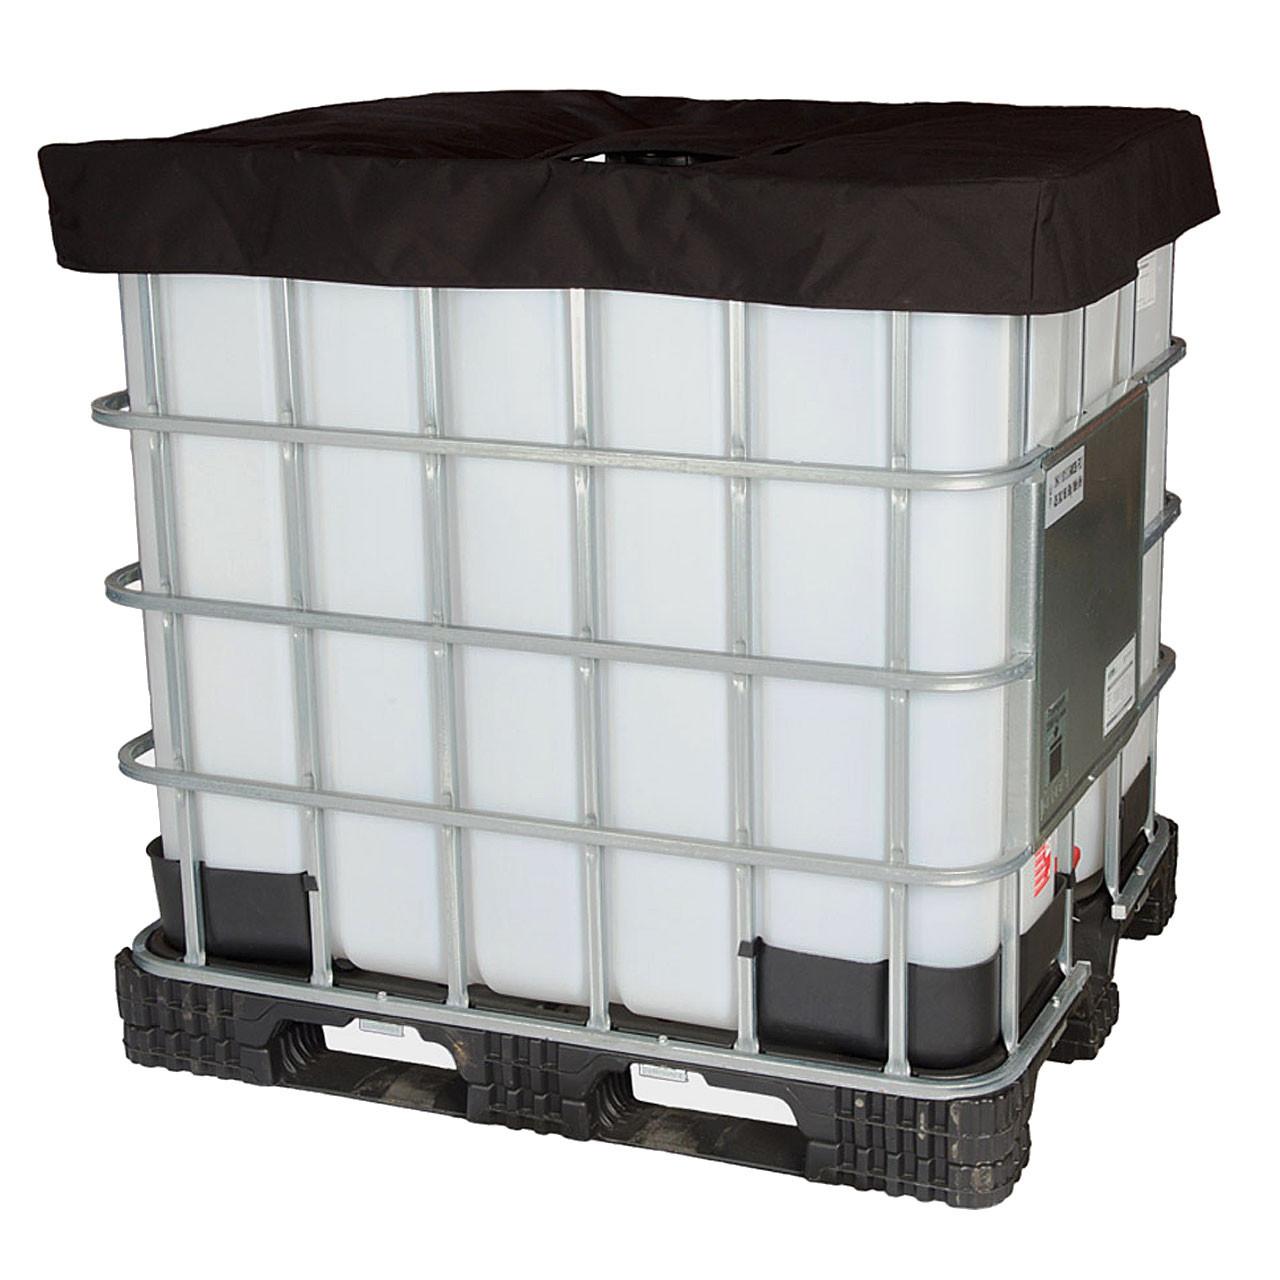 isolierdeckel f r 1000l ibc container rekubik. Black Bedroom Furniture Sets. Home Design Ideas